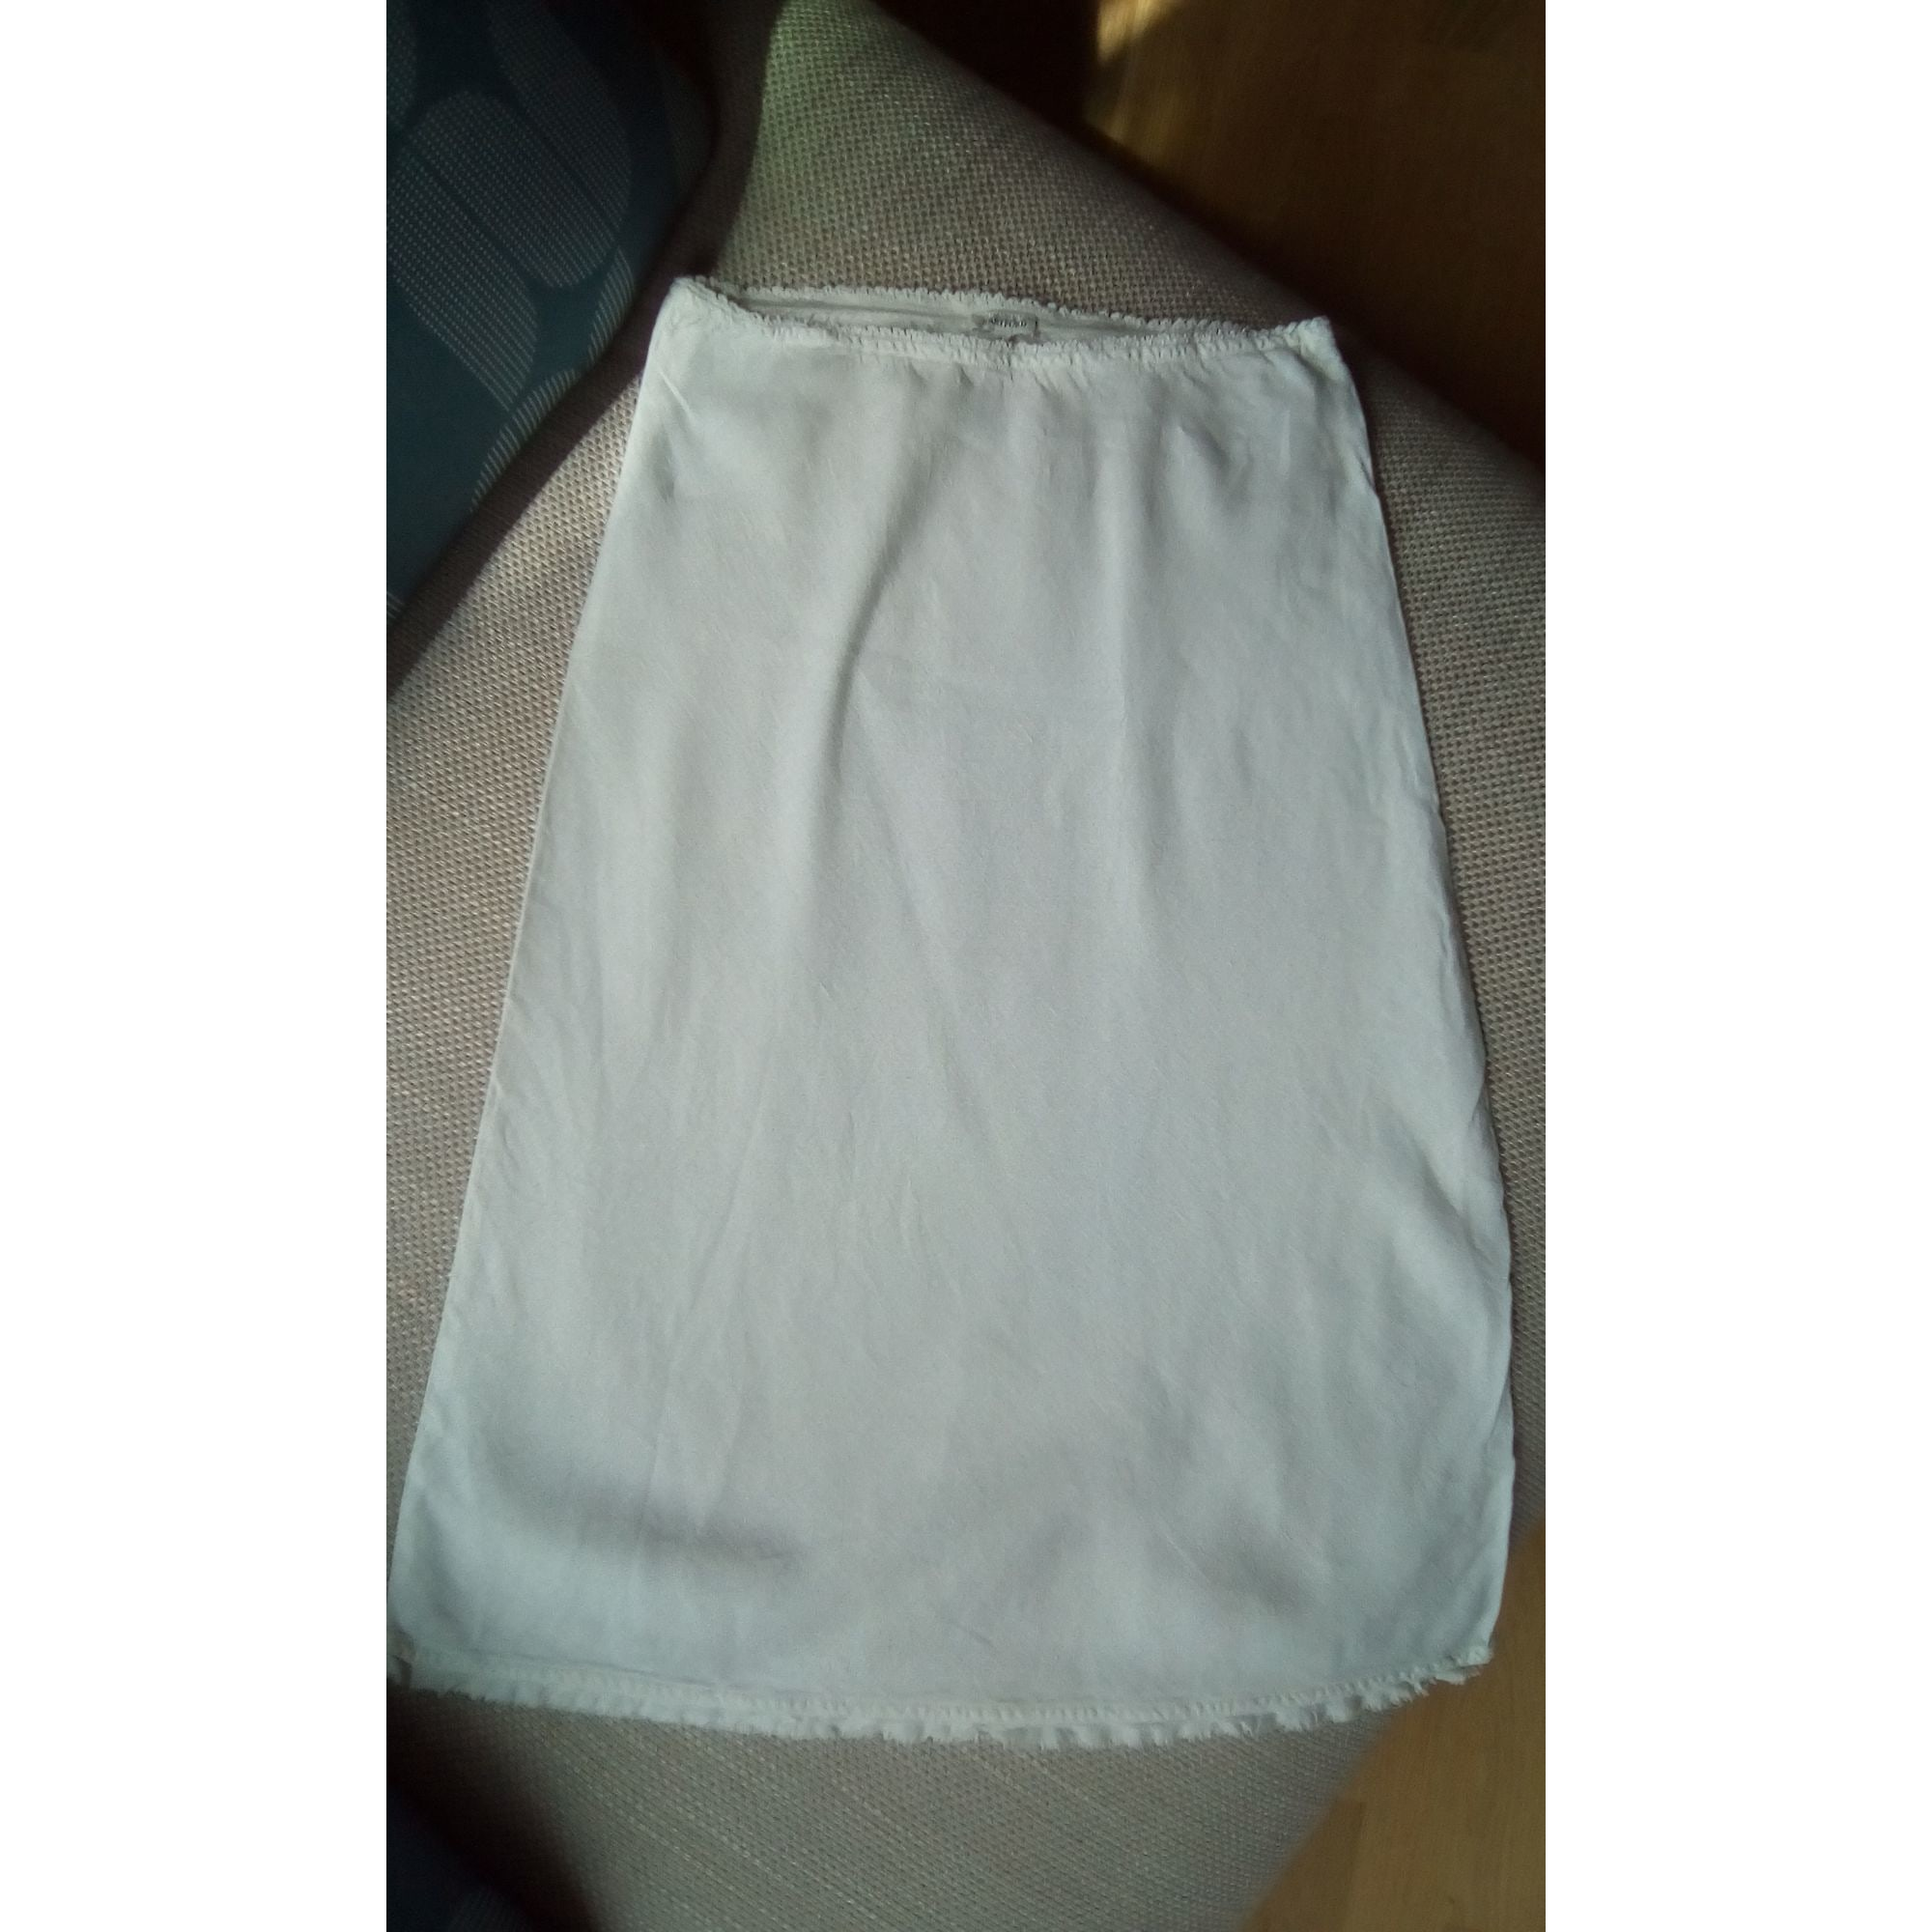 Jupe mi-longue HARTFORD Blanc, blanc cassé, écru